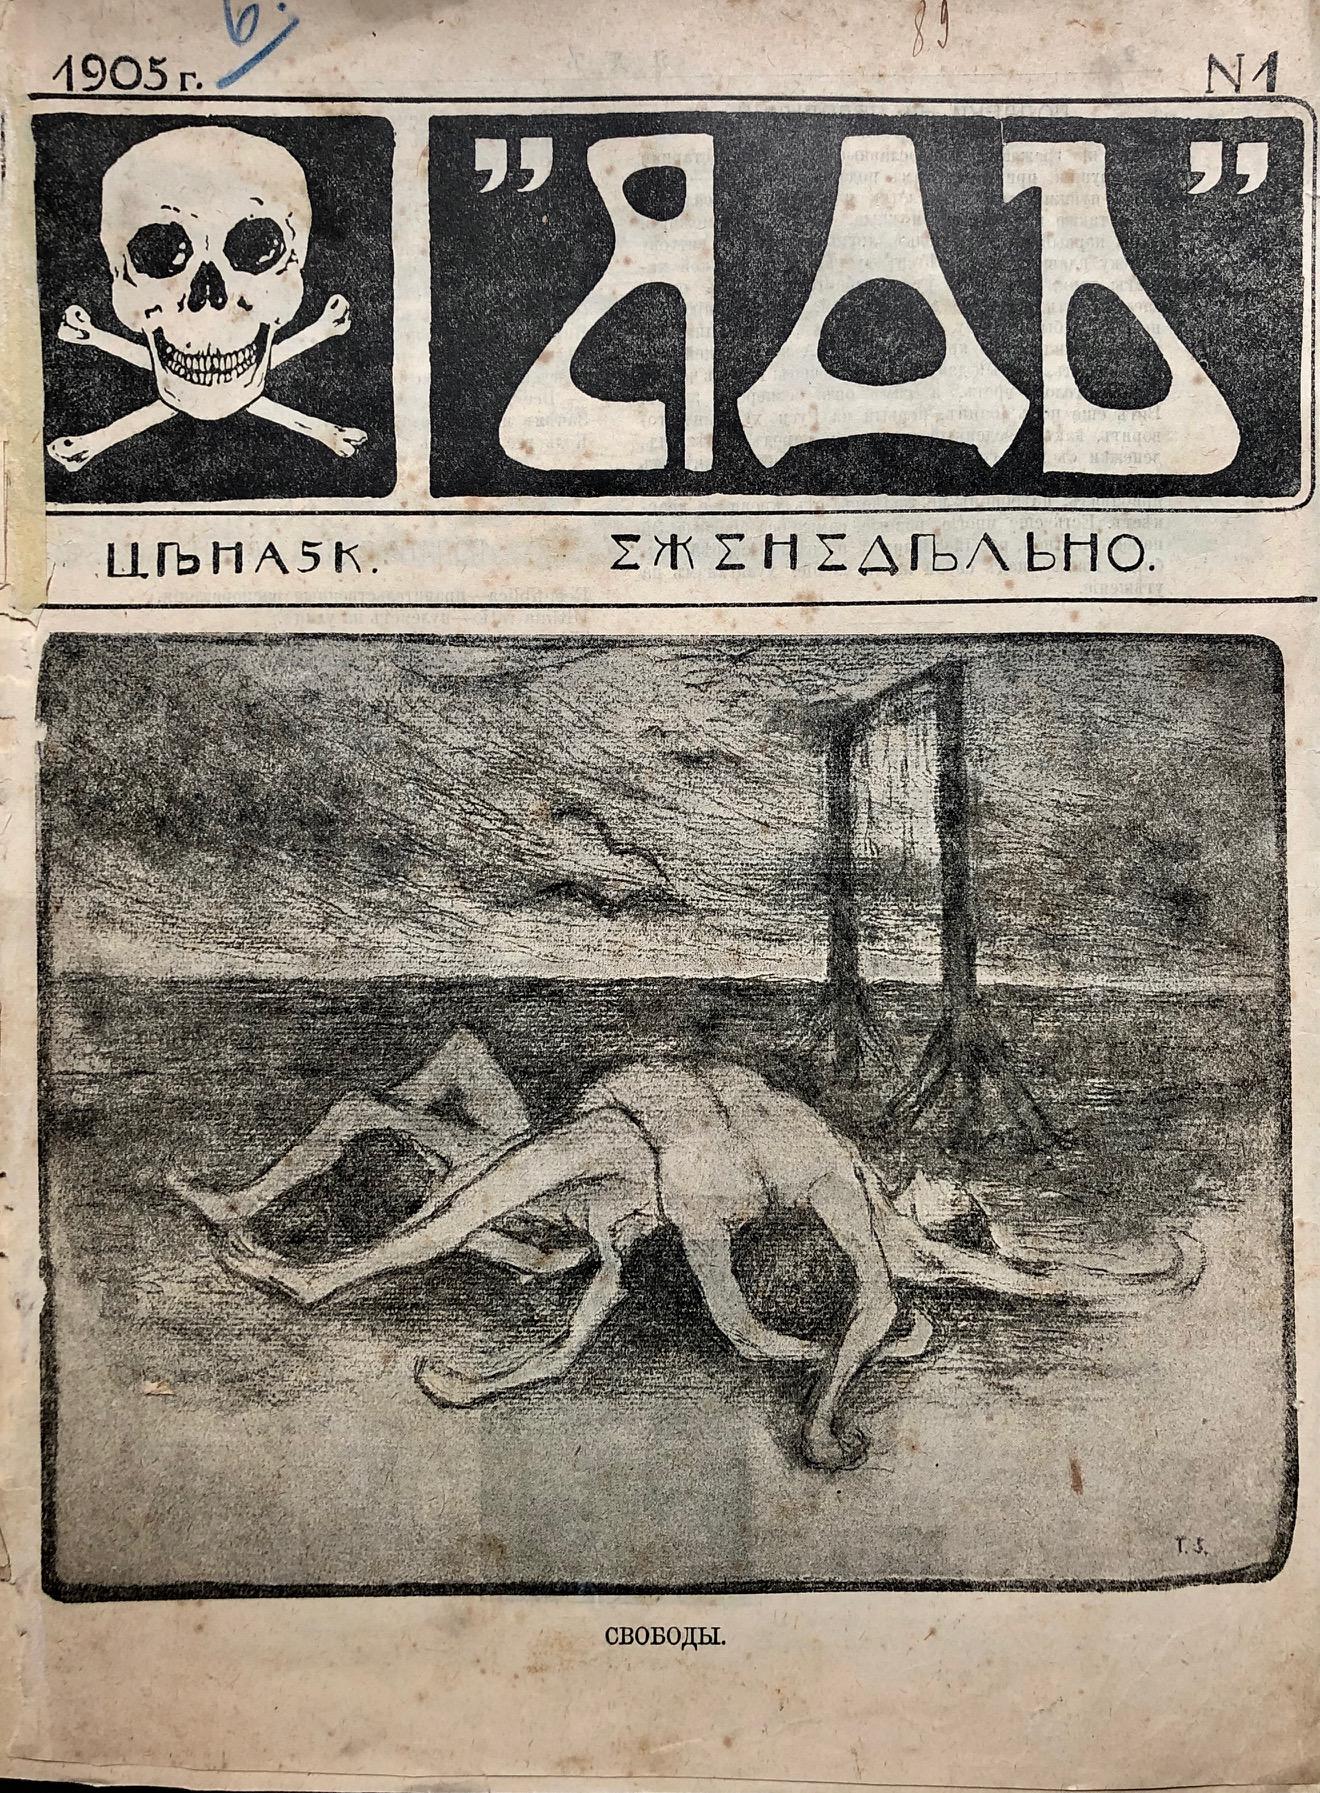 Lot 515 - Le poison. Яд. Еженедельно. 1905 г. Редактор-издатель [...]